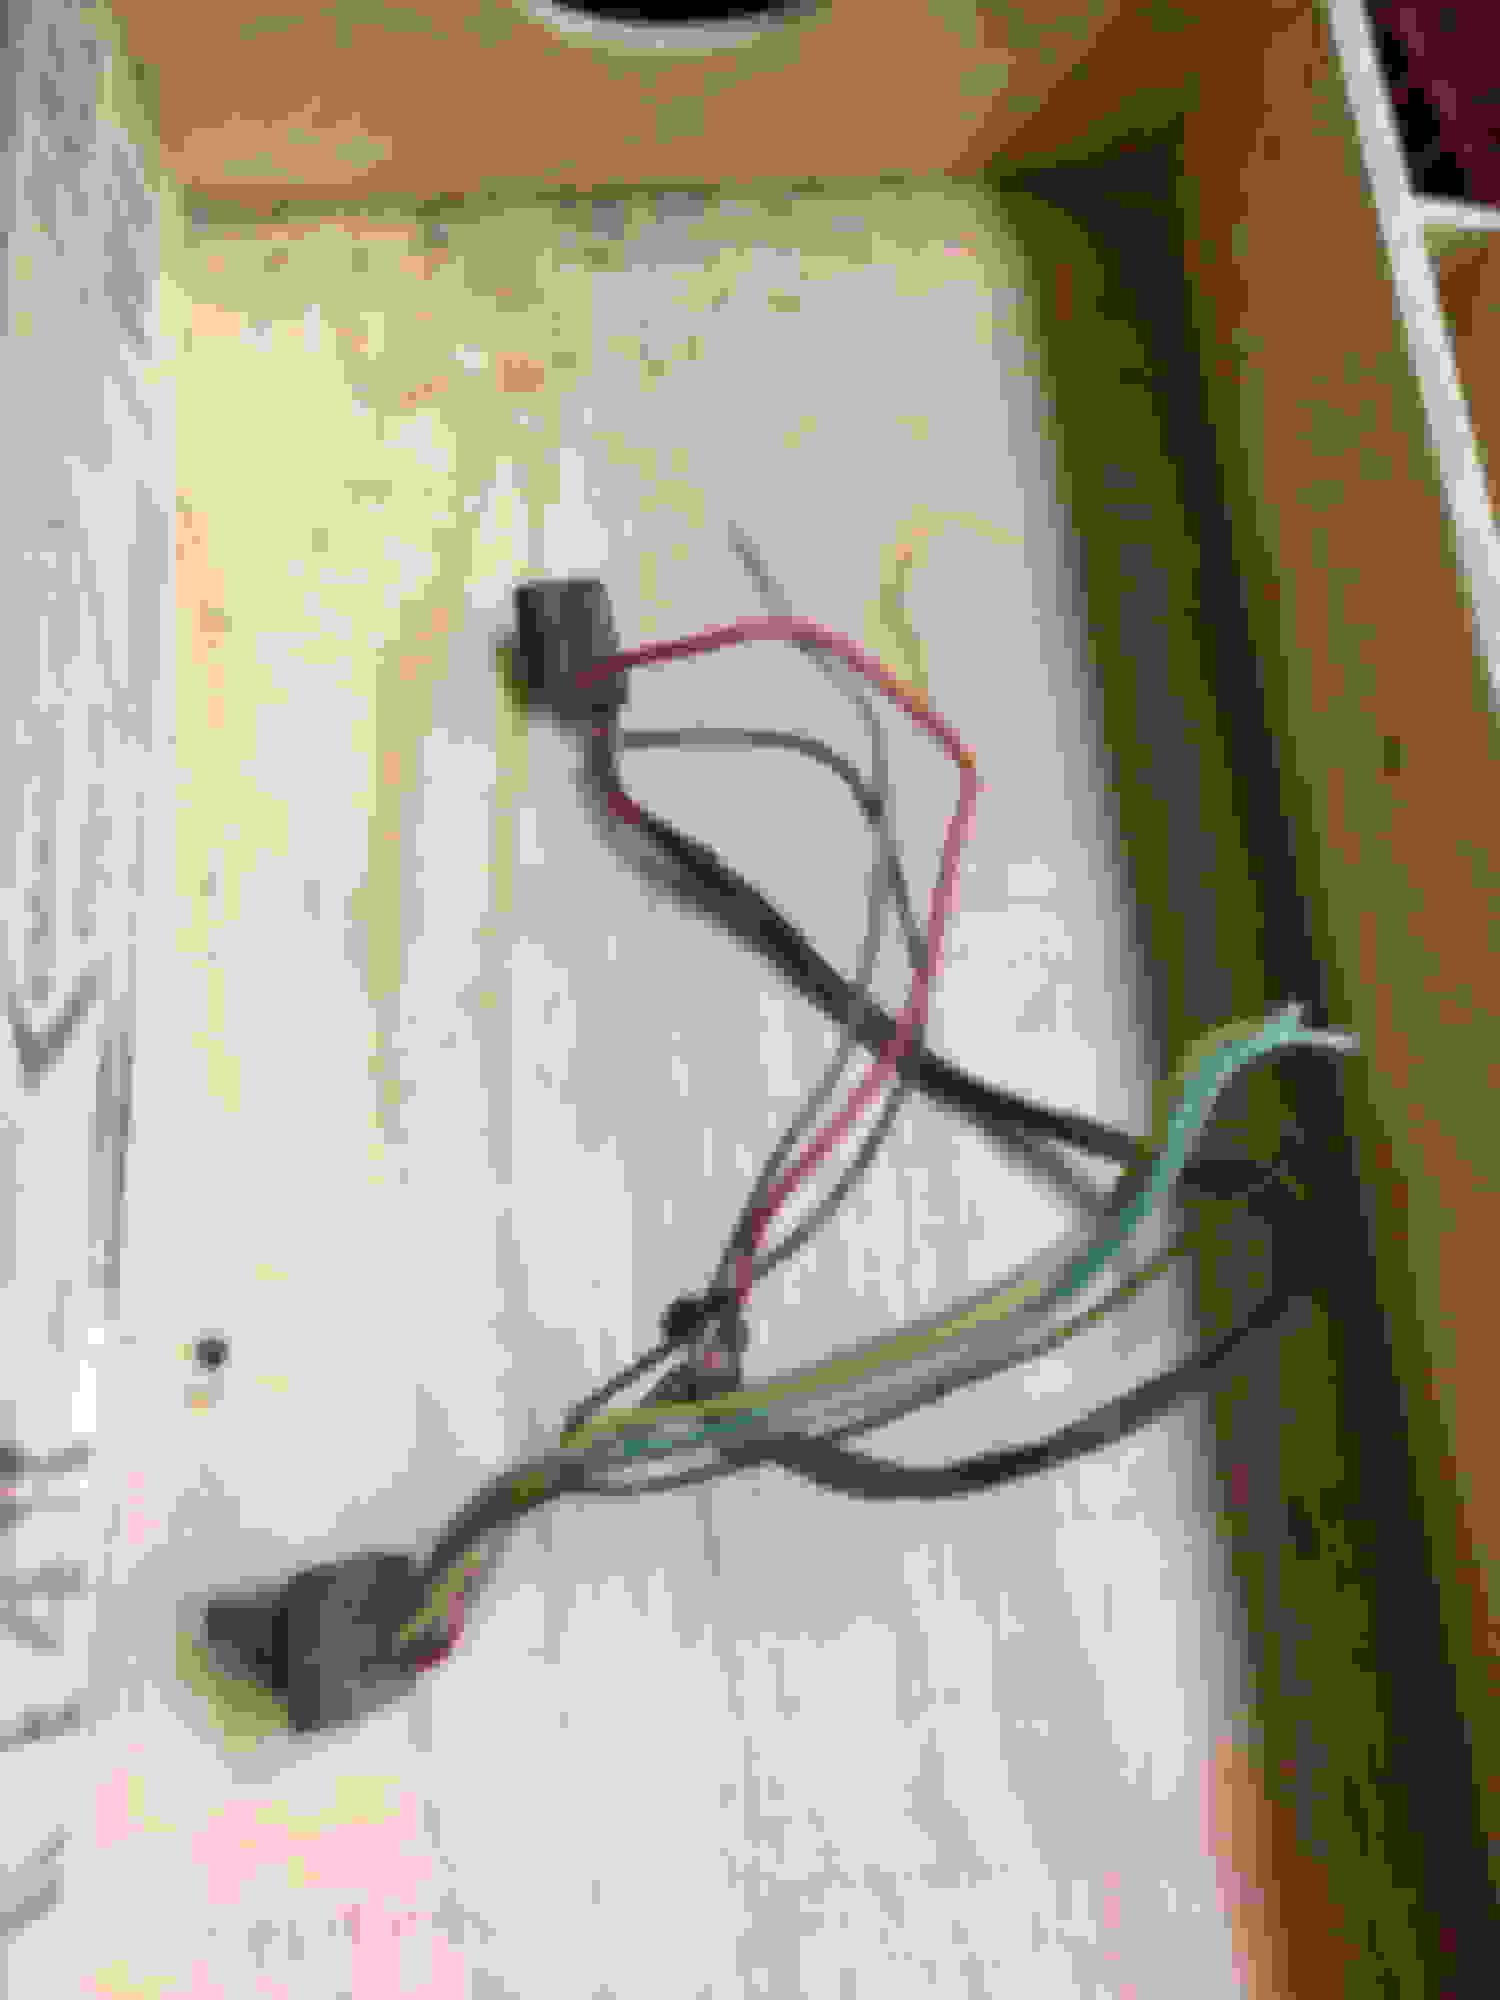 64 Ford F100 Headlight Wiring